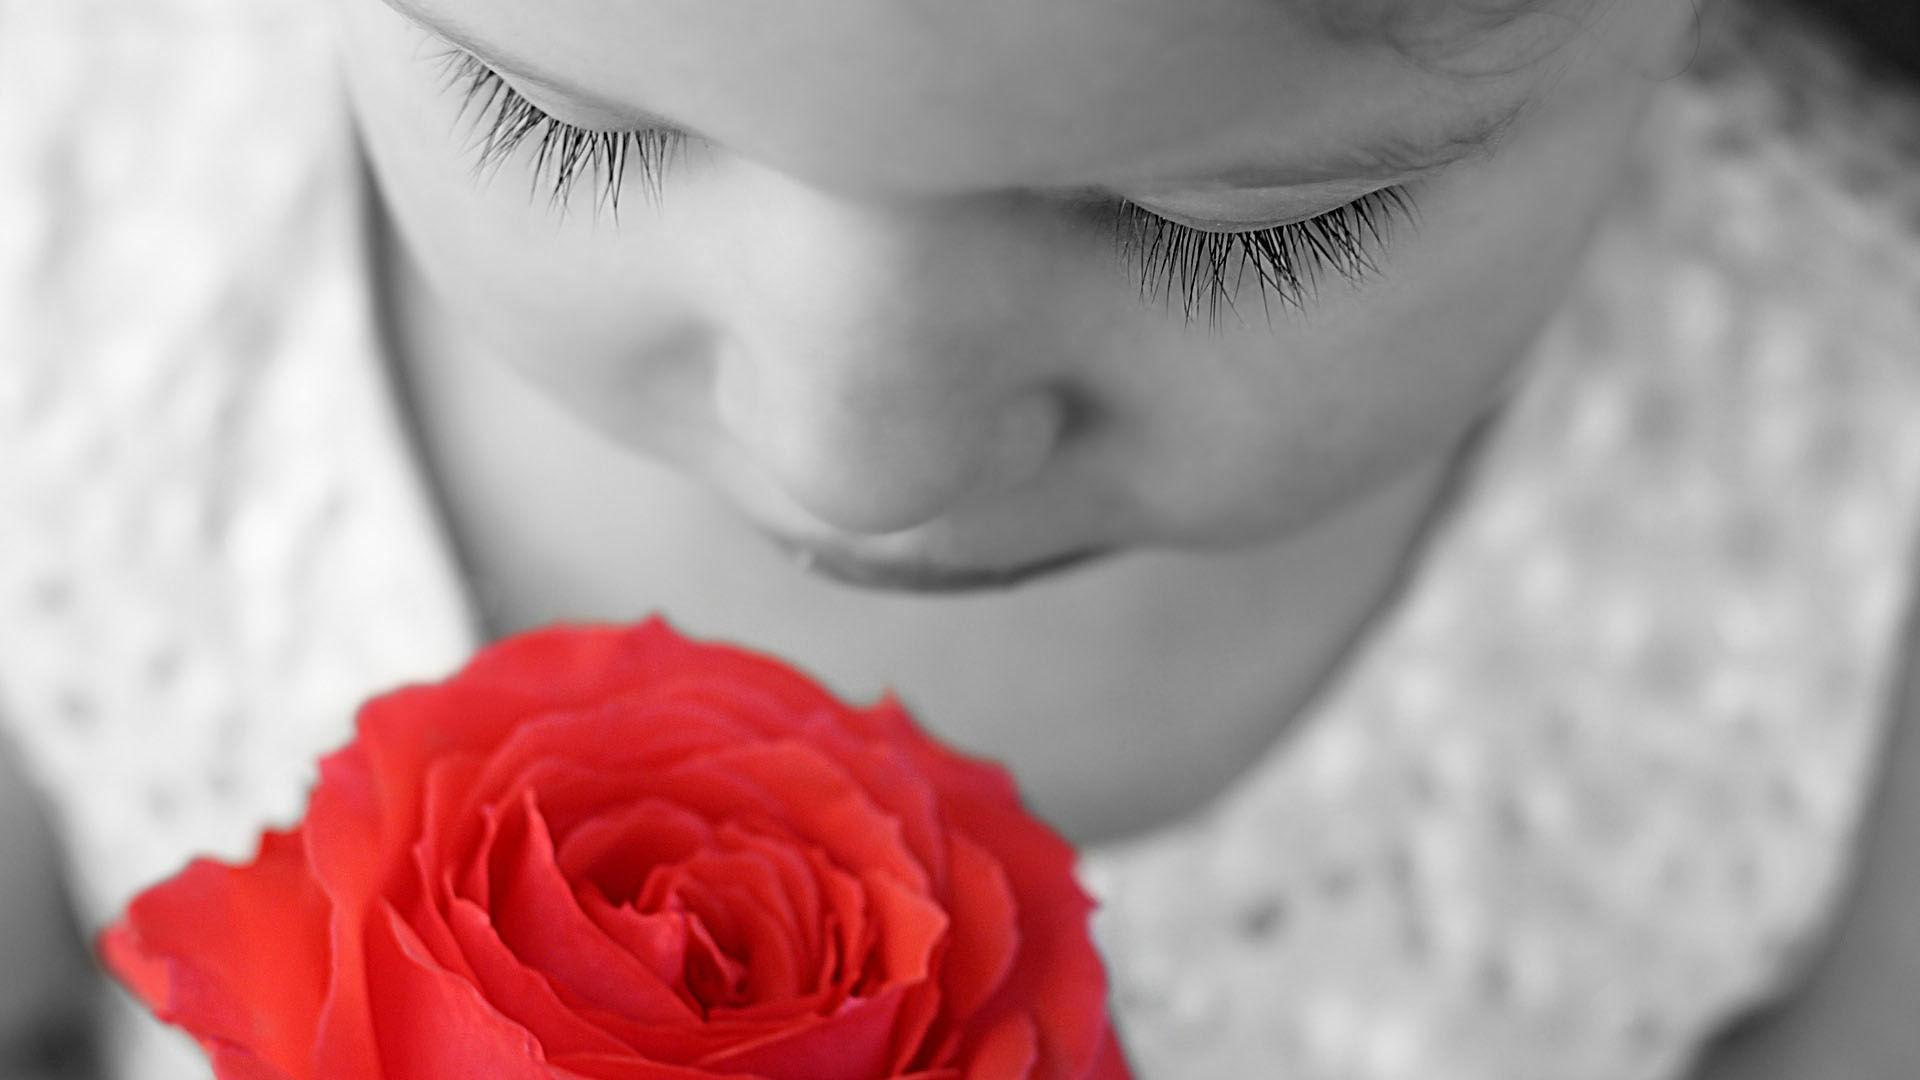 Психологи подтвердили влияние запаха роз на память